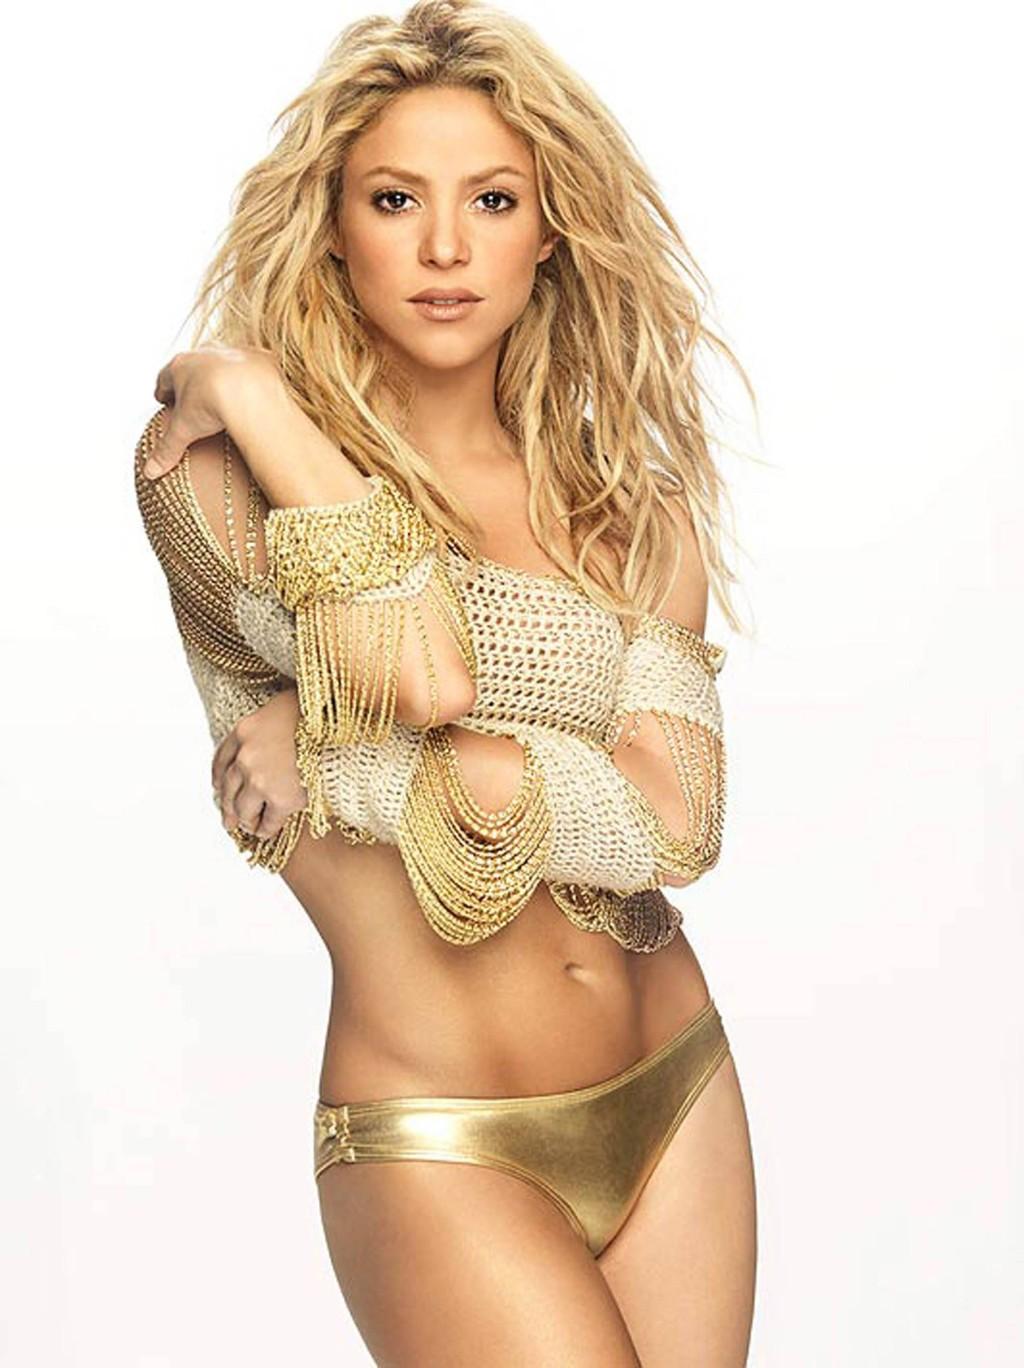 Shakira Bikini Shakira Bikini Foto Von Jennee